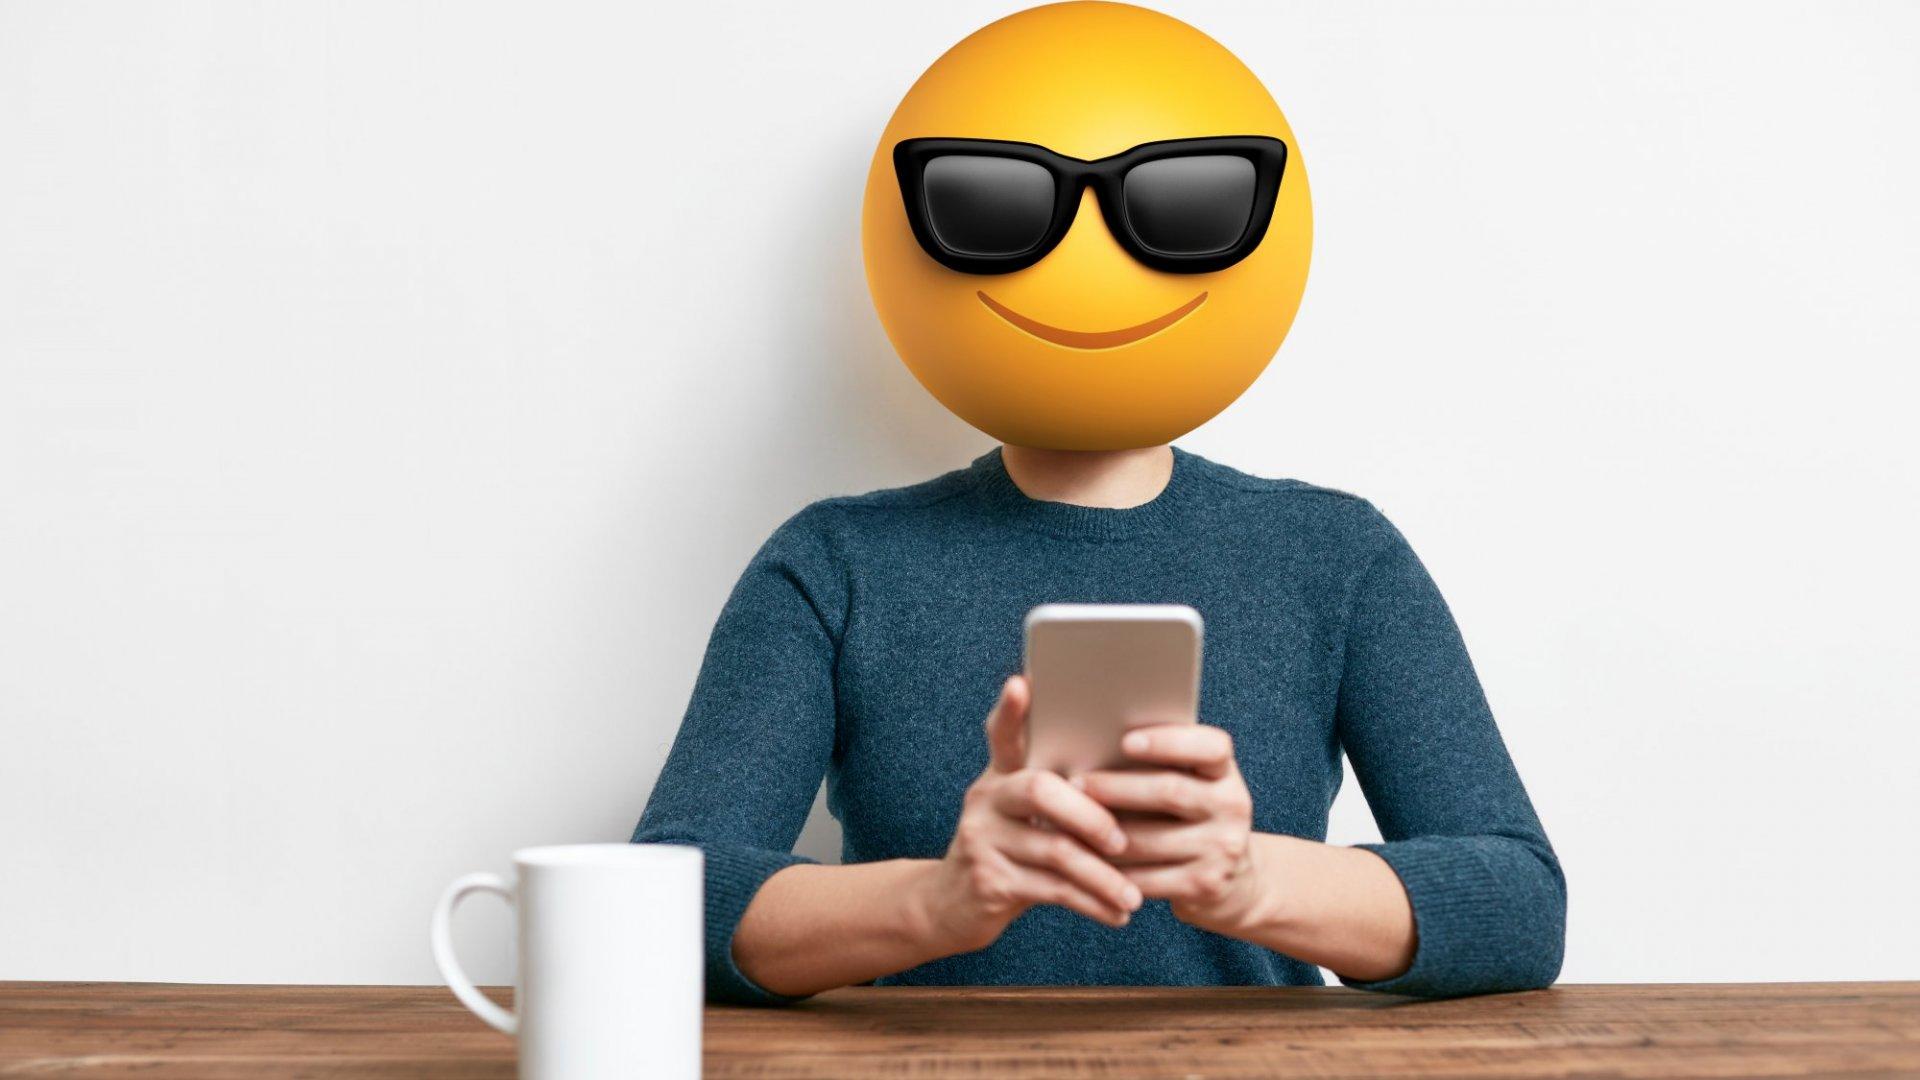 The next emoji millionaire.